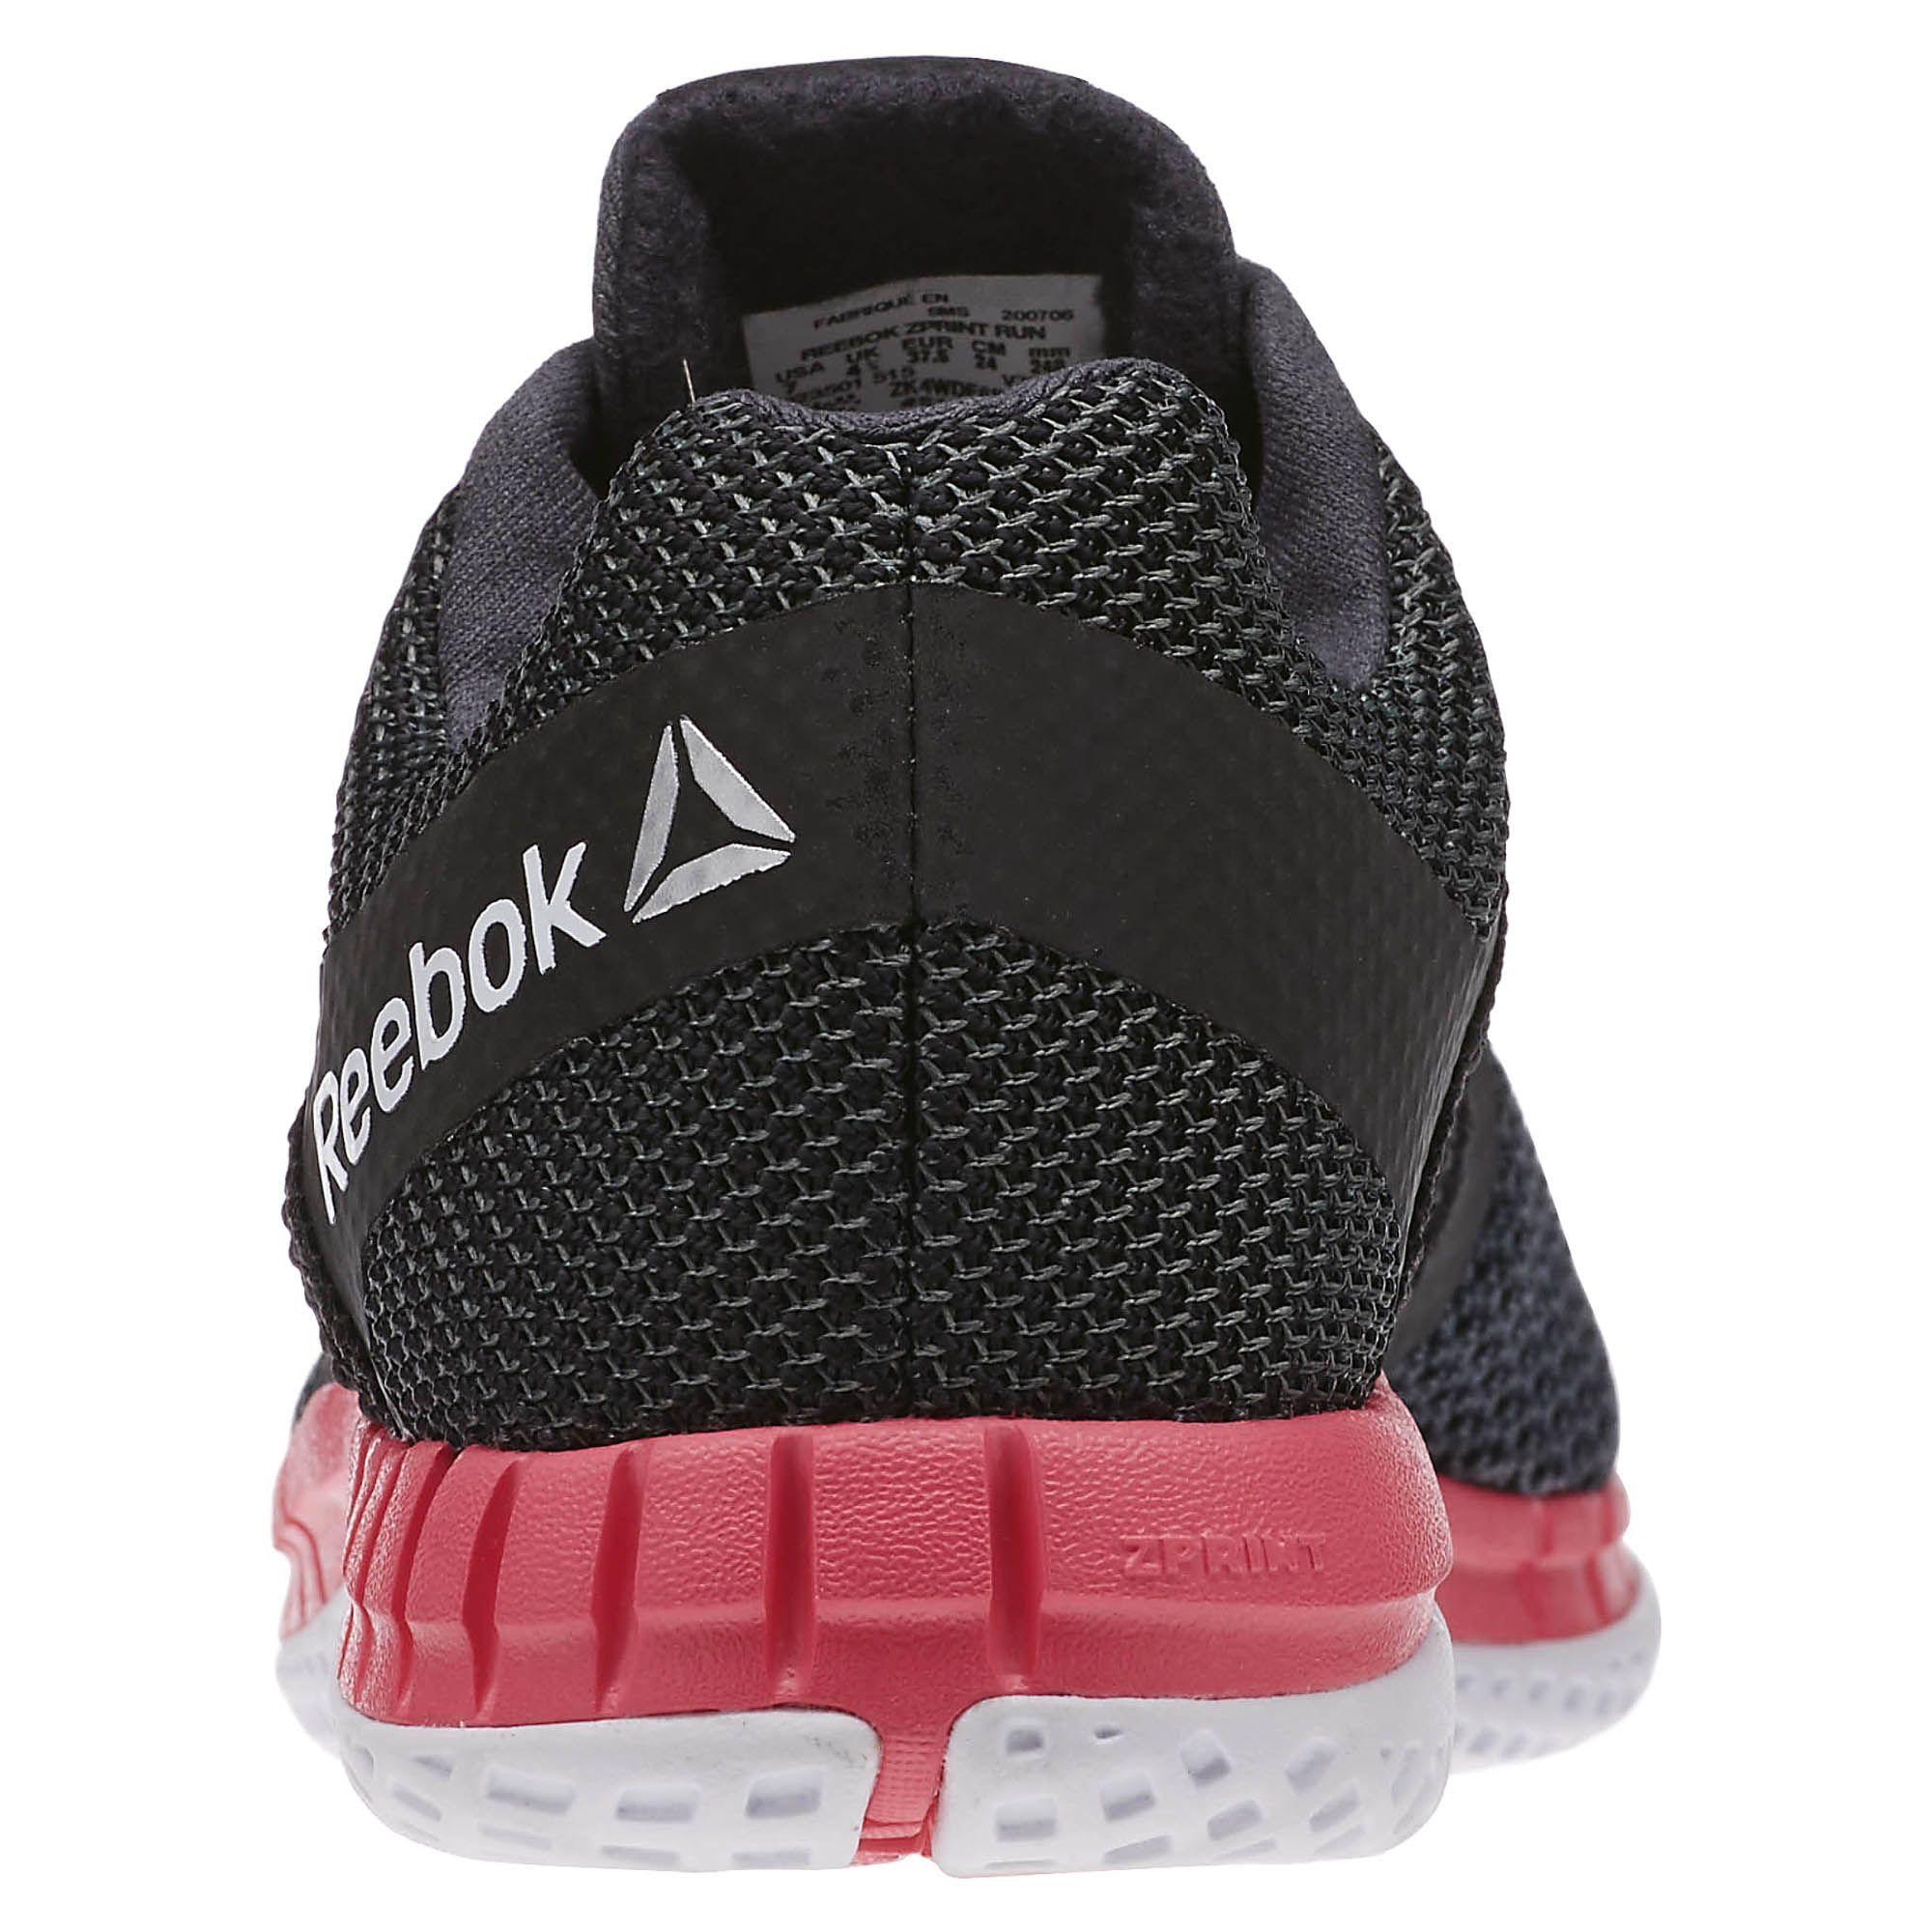 Al di fuori miscelatore sollevamento  Reebok - Reebok ZPrint Run | Reebok, Shopping outfit, Sport shoes